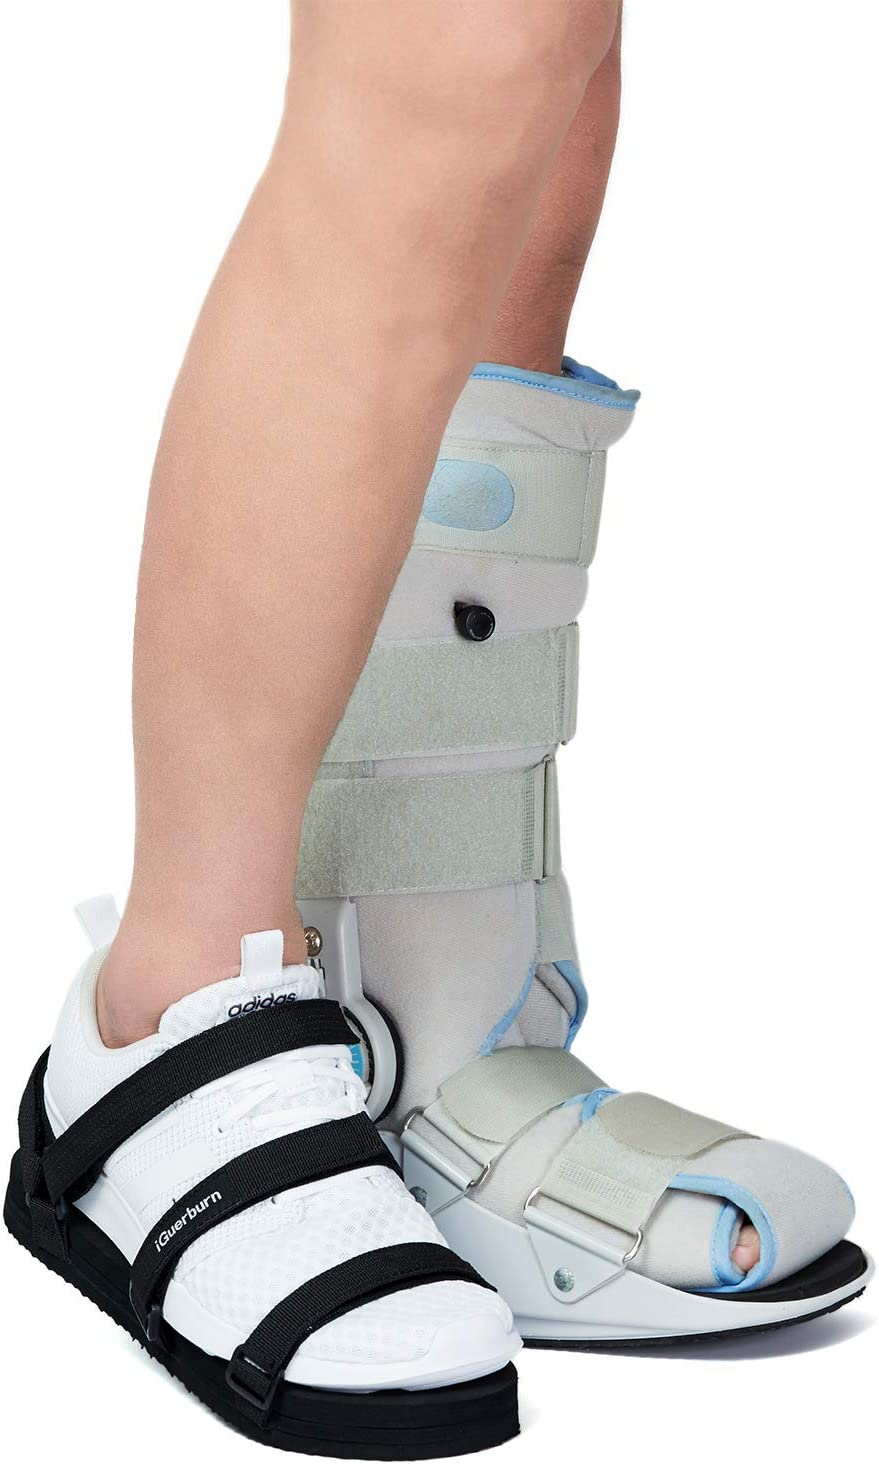 Small Healvaluefit Shoe Leveler Shoe Lift Shoe Balancer for Walking Boot Height Enhancing Shoe